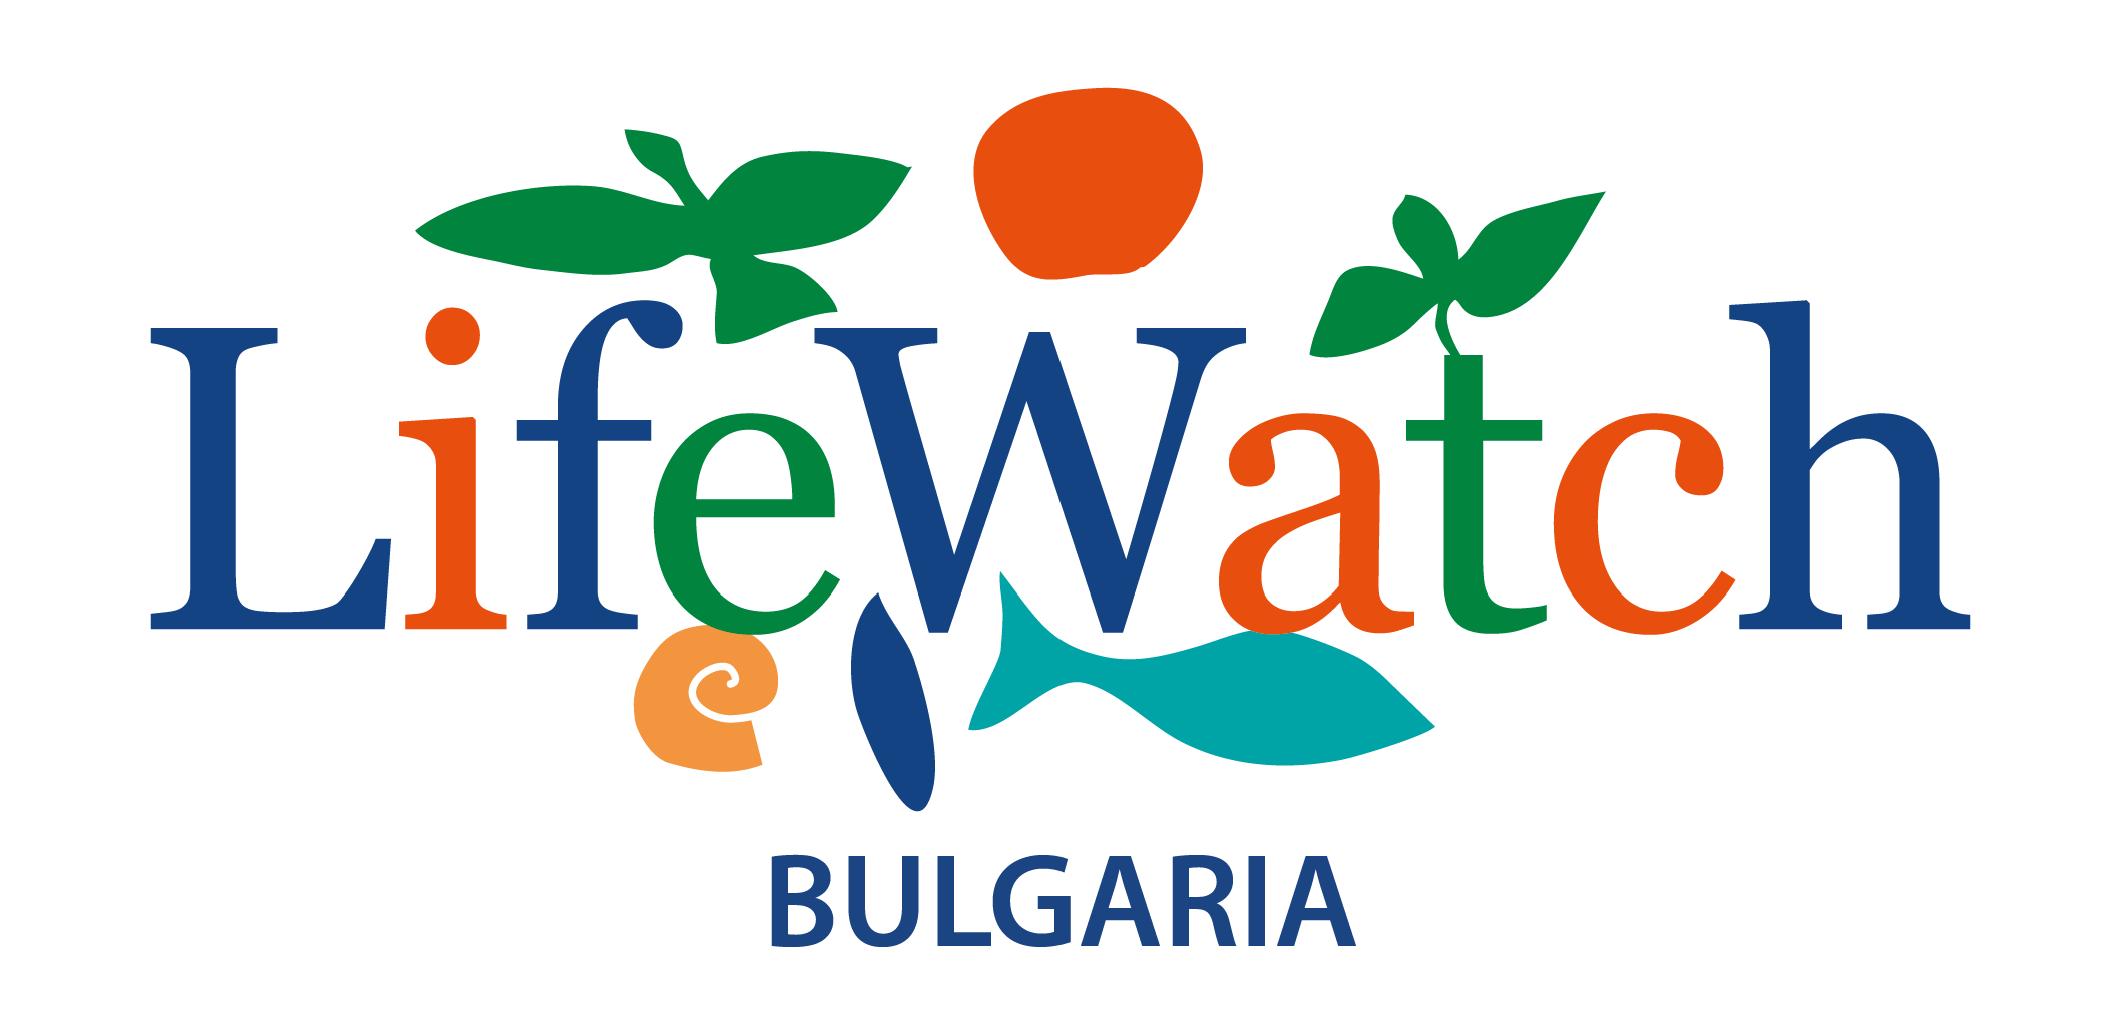 Welcome, LifeWatch Bulgaria!